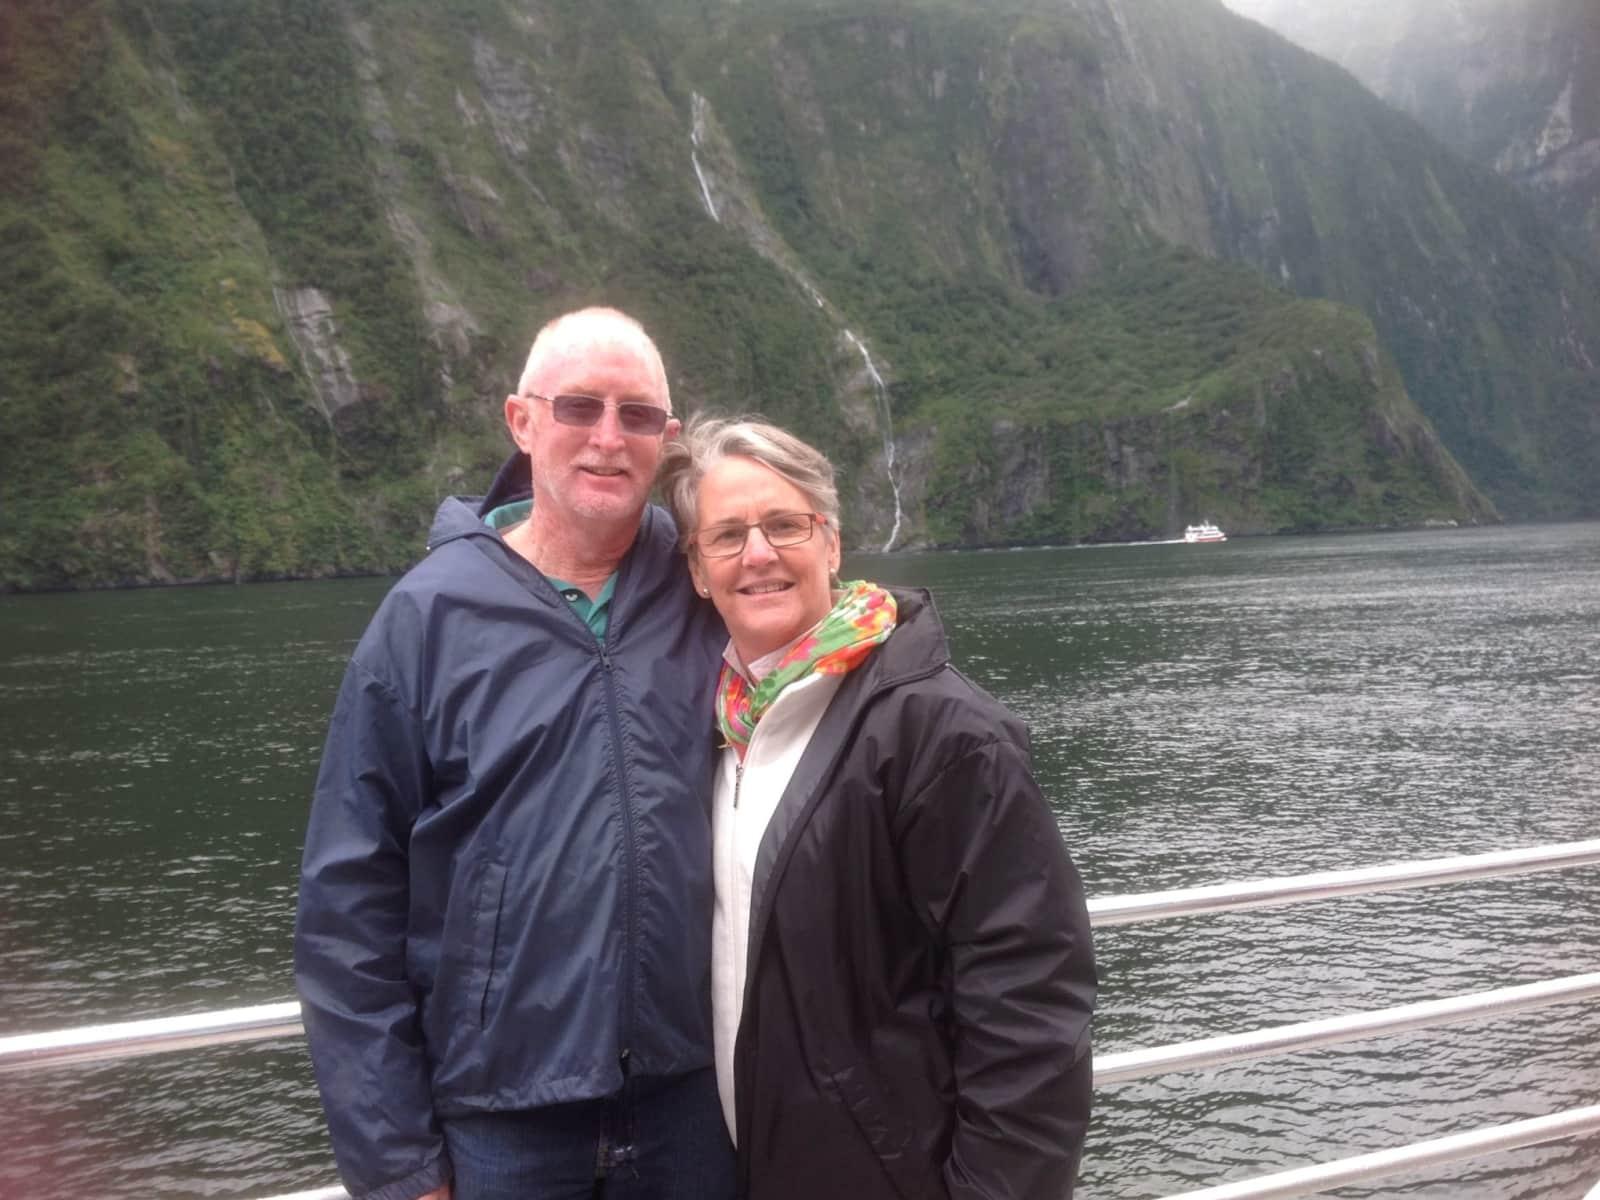 Kathryn & Edward from Bathurst, New South Wales, Australia